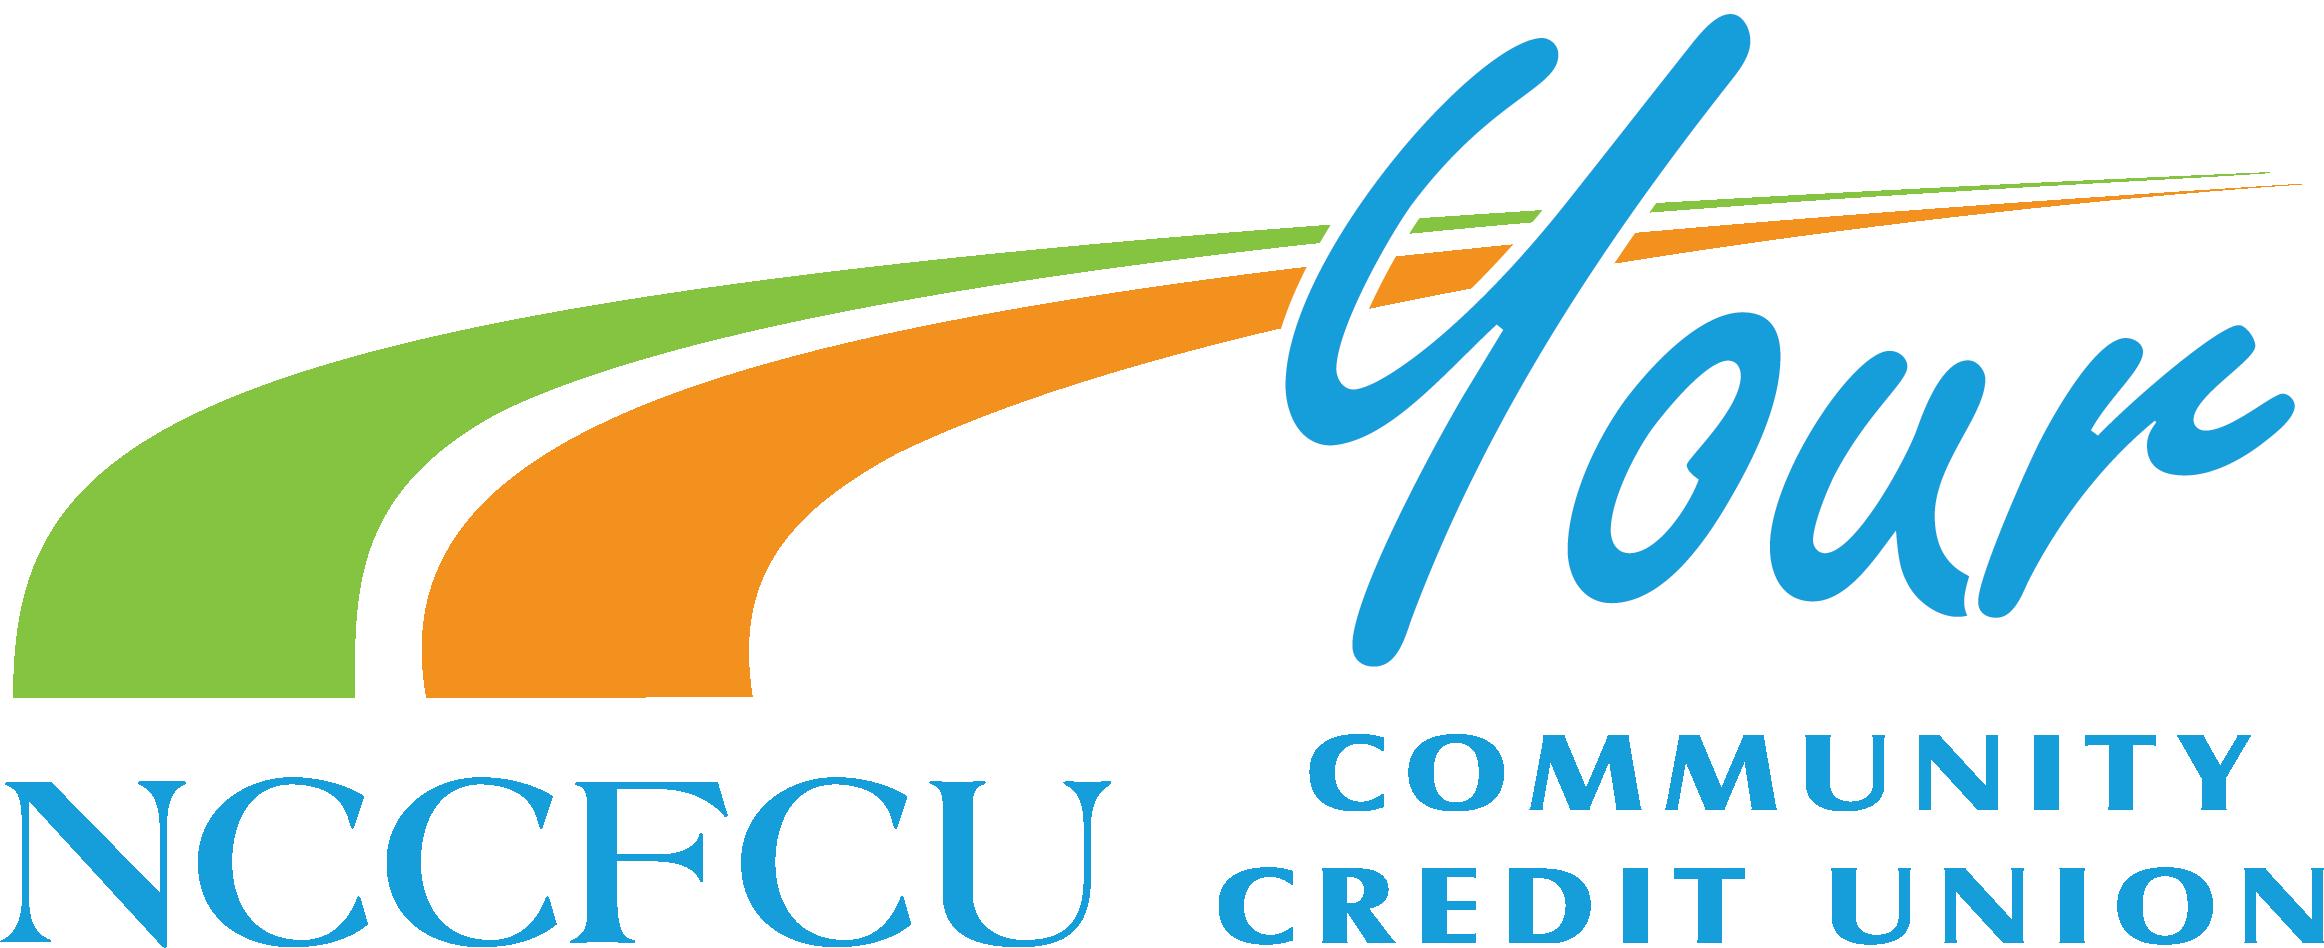 North Carolina Community FCU Joins CUAC Program